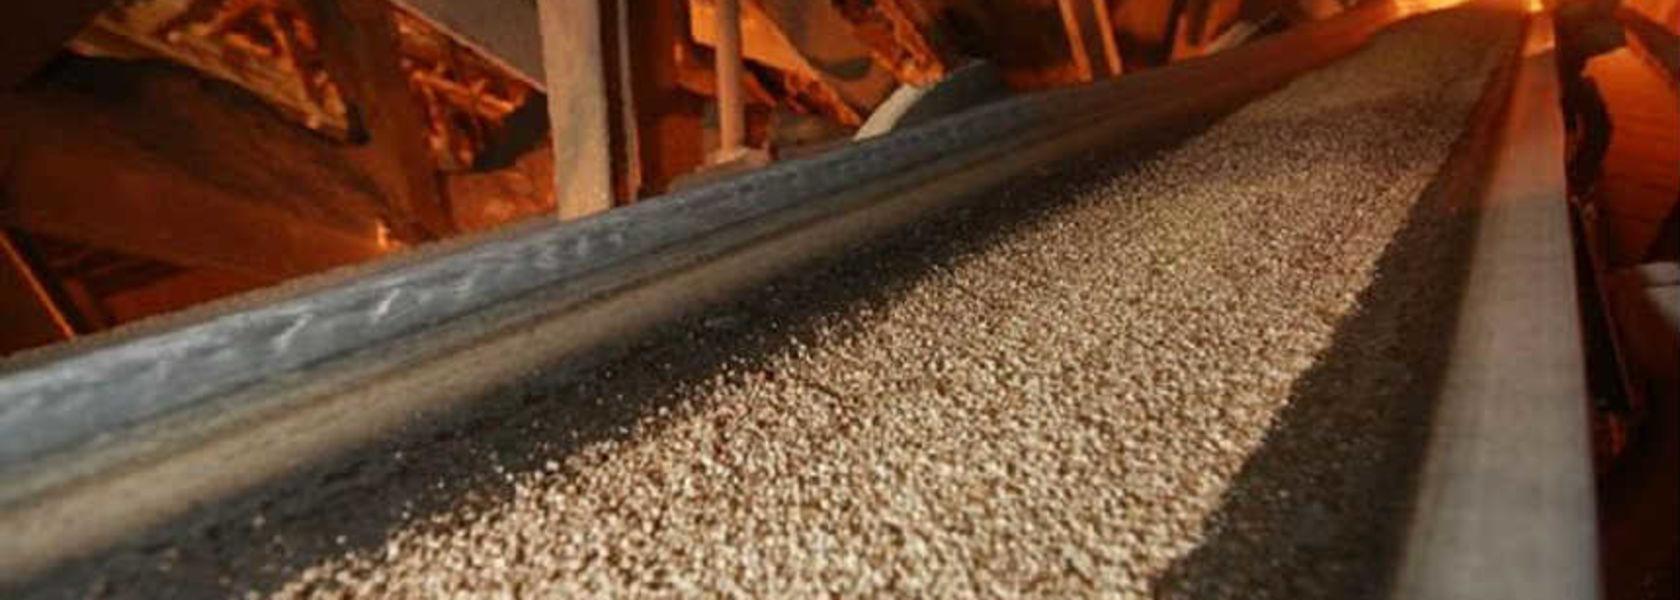 Vale on cusp of fertiliser sale' - Mining Journal